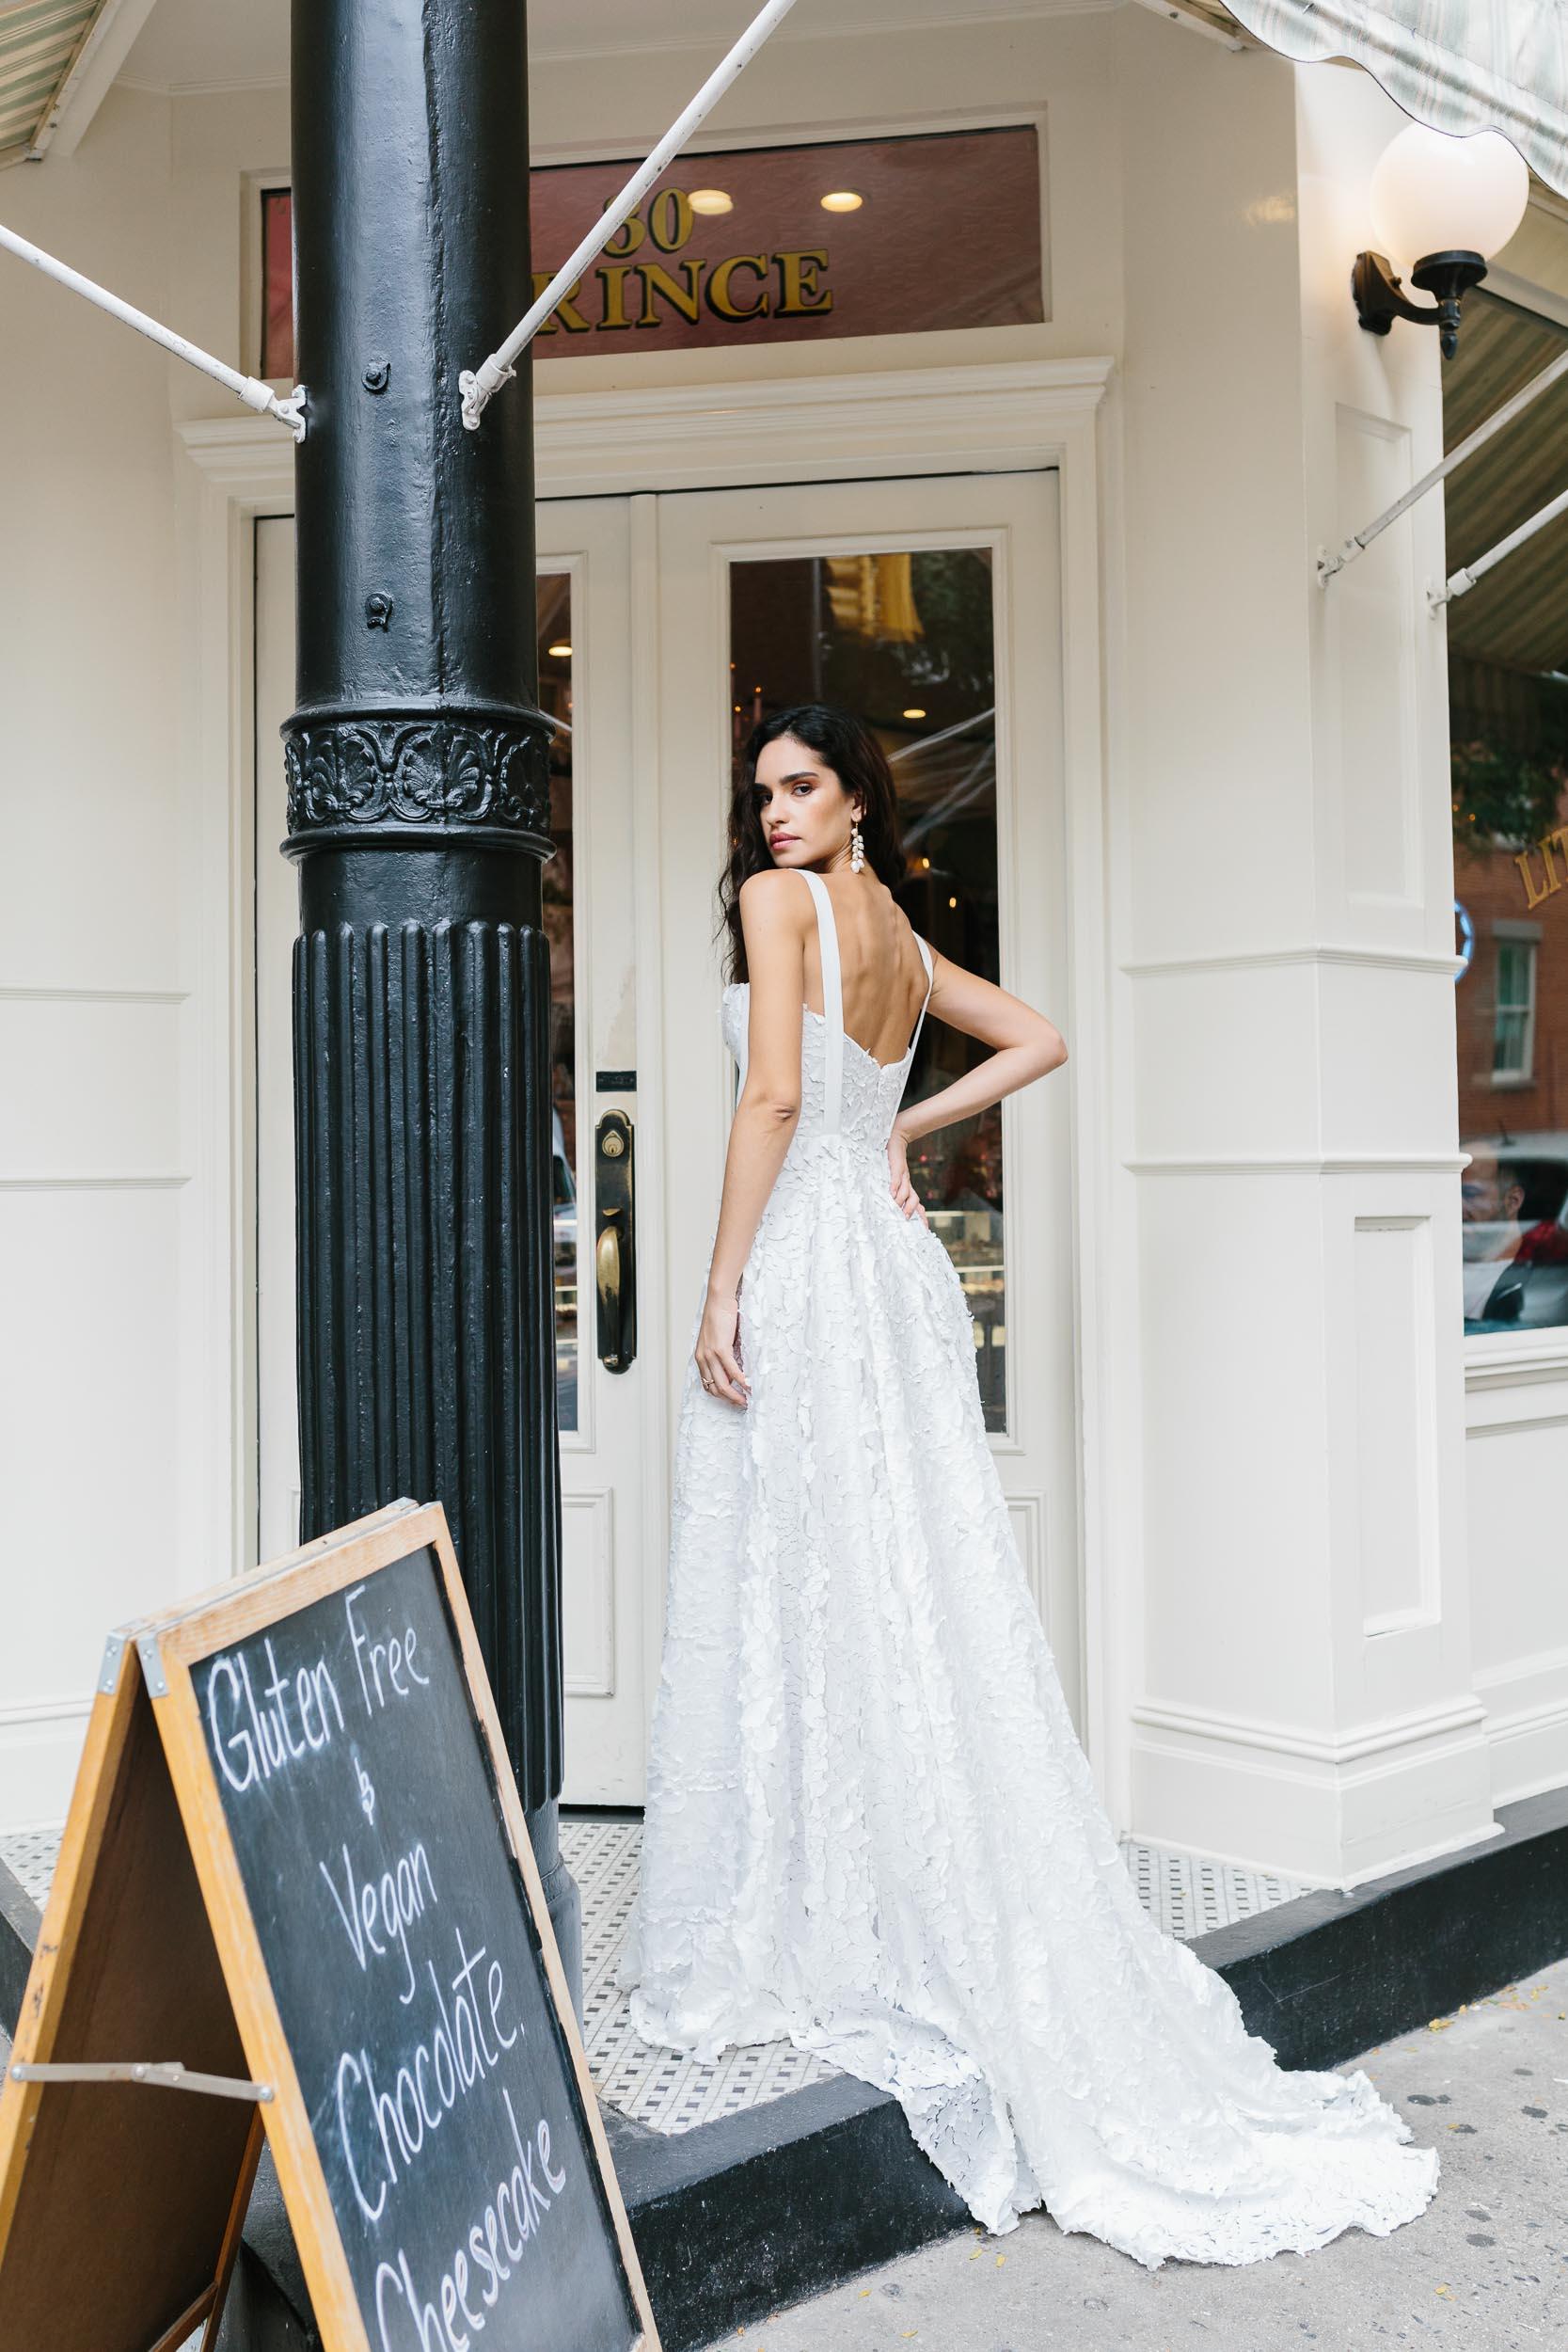 Kas-Richards-Fashion-Editorial-Photographer-New-York-Georgia-Young-Couture-27.jpg